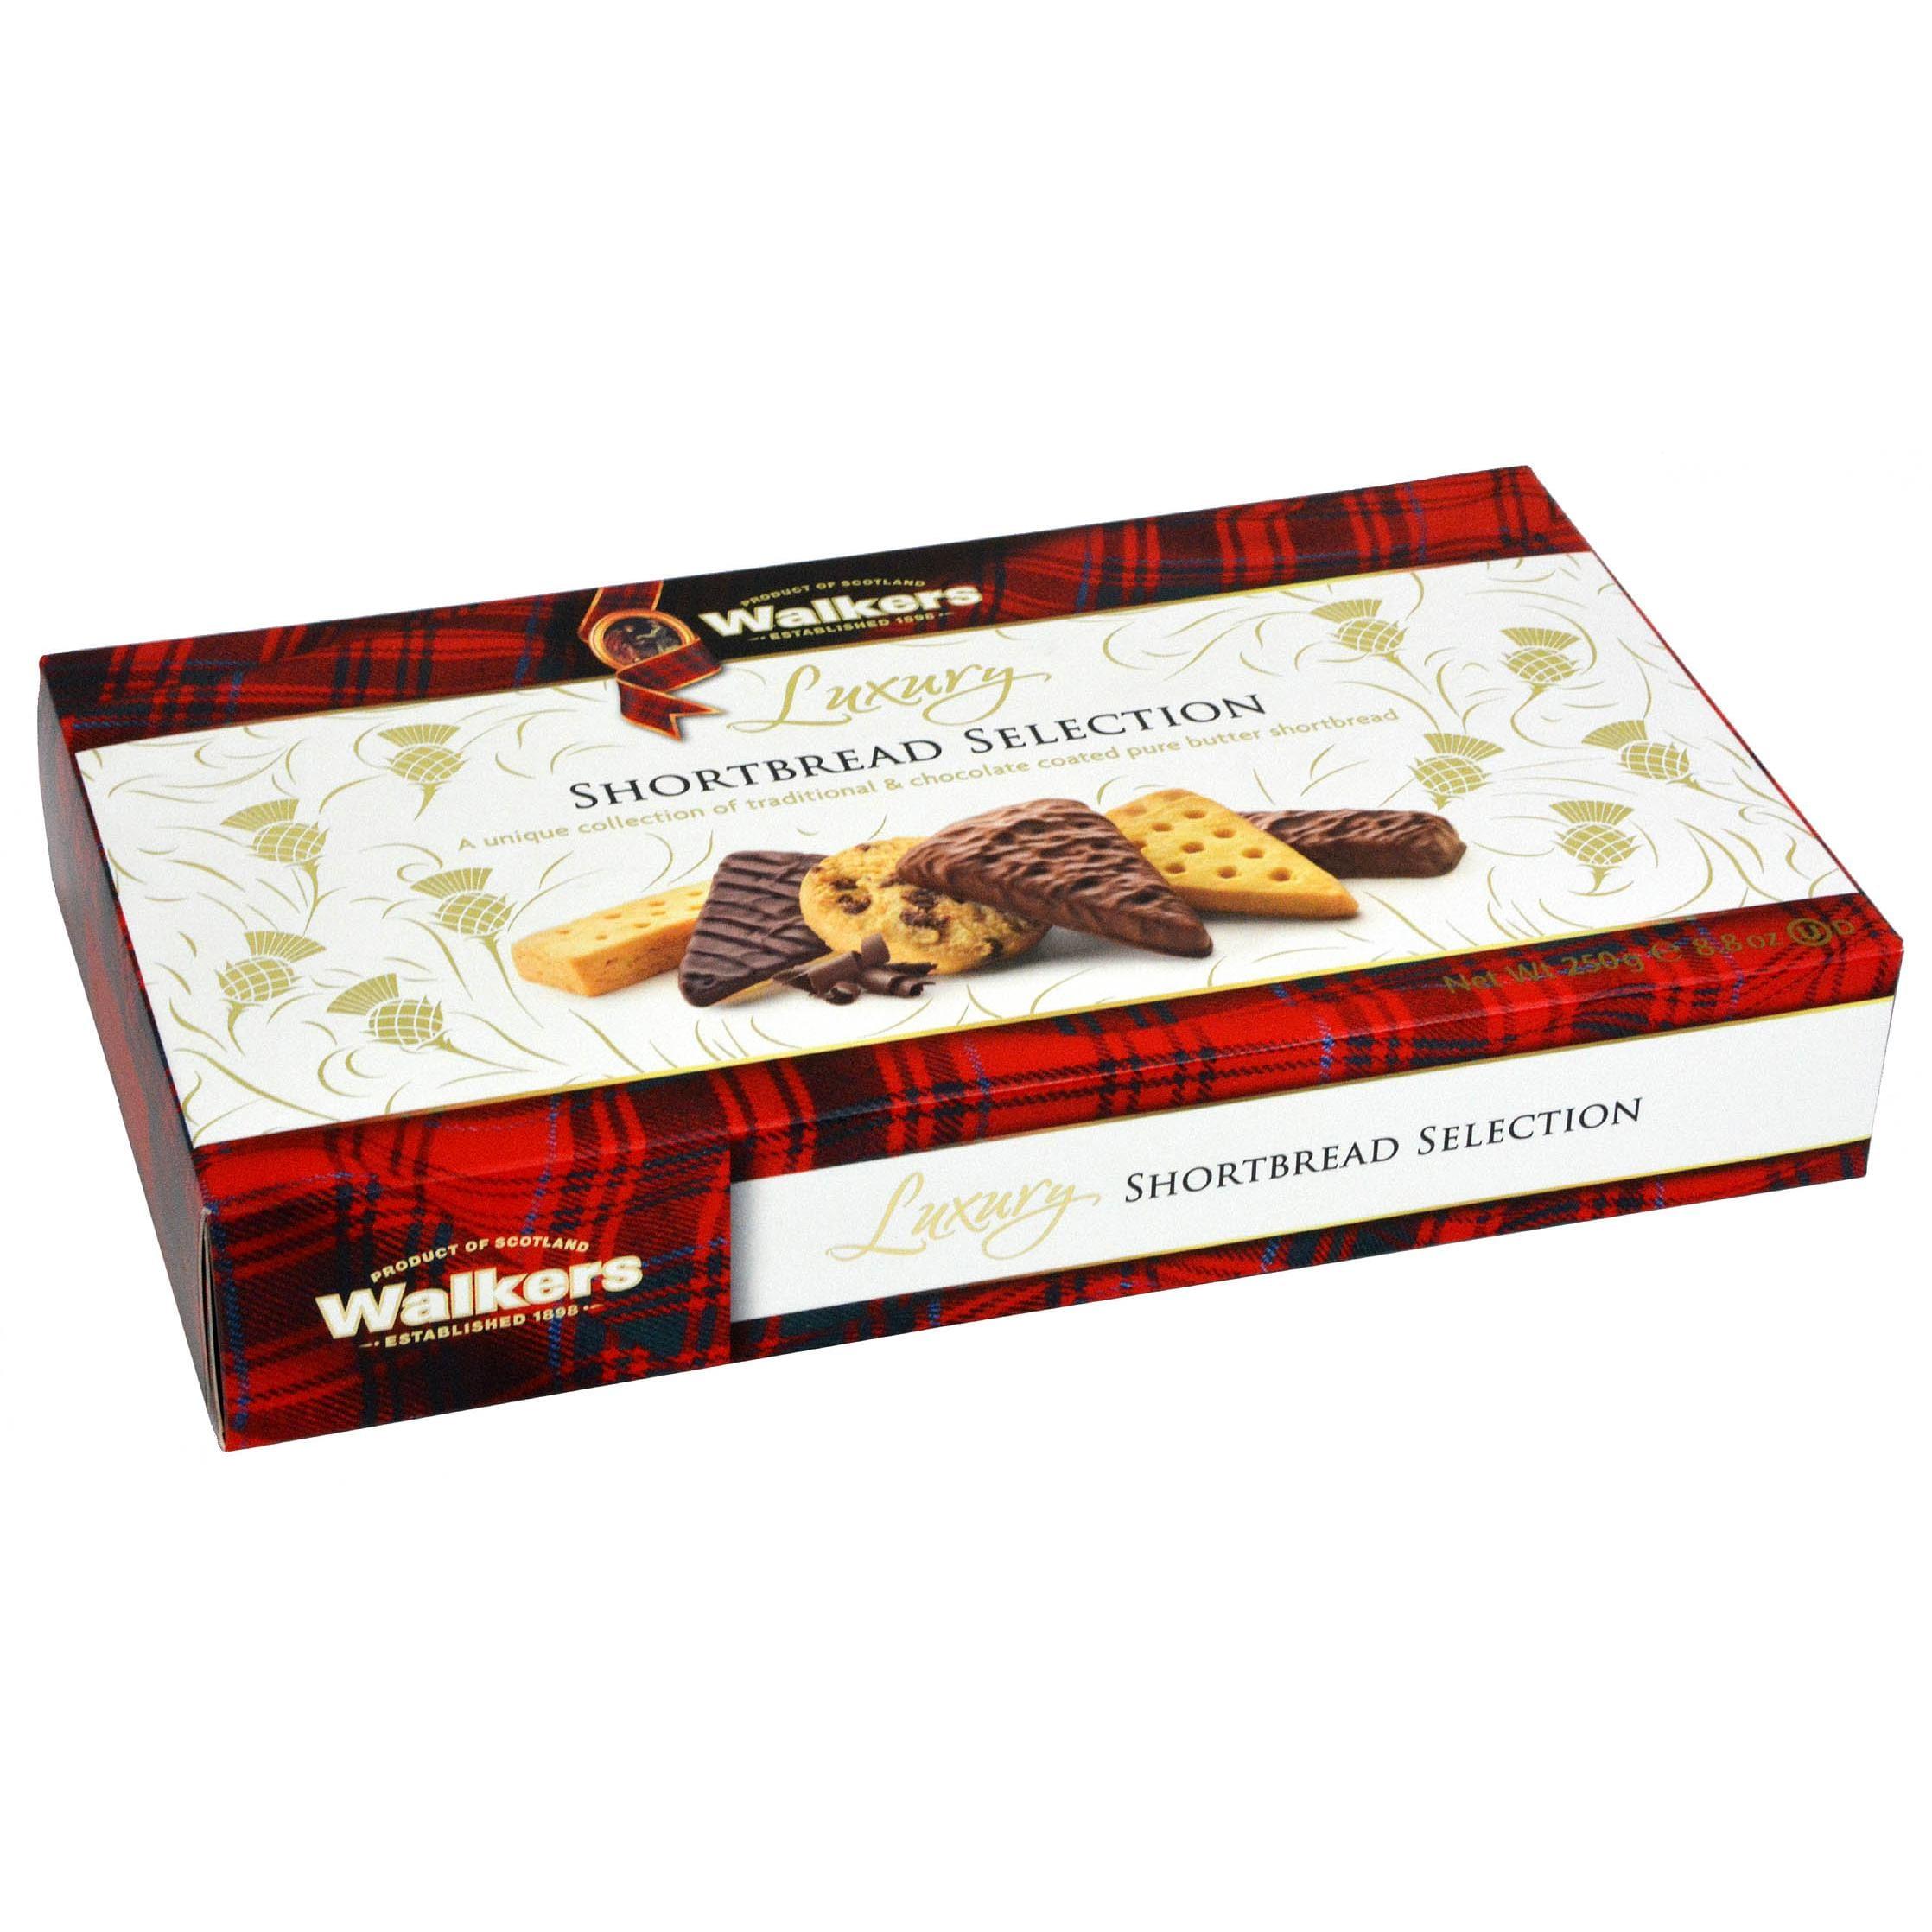 Walkers Luxury Shortbread Selection with Chocolate 250g - Buttergebäckmischung